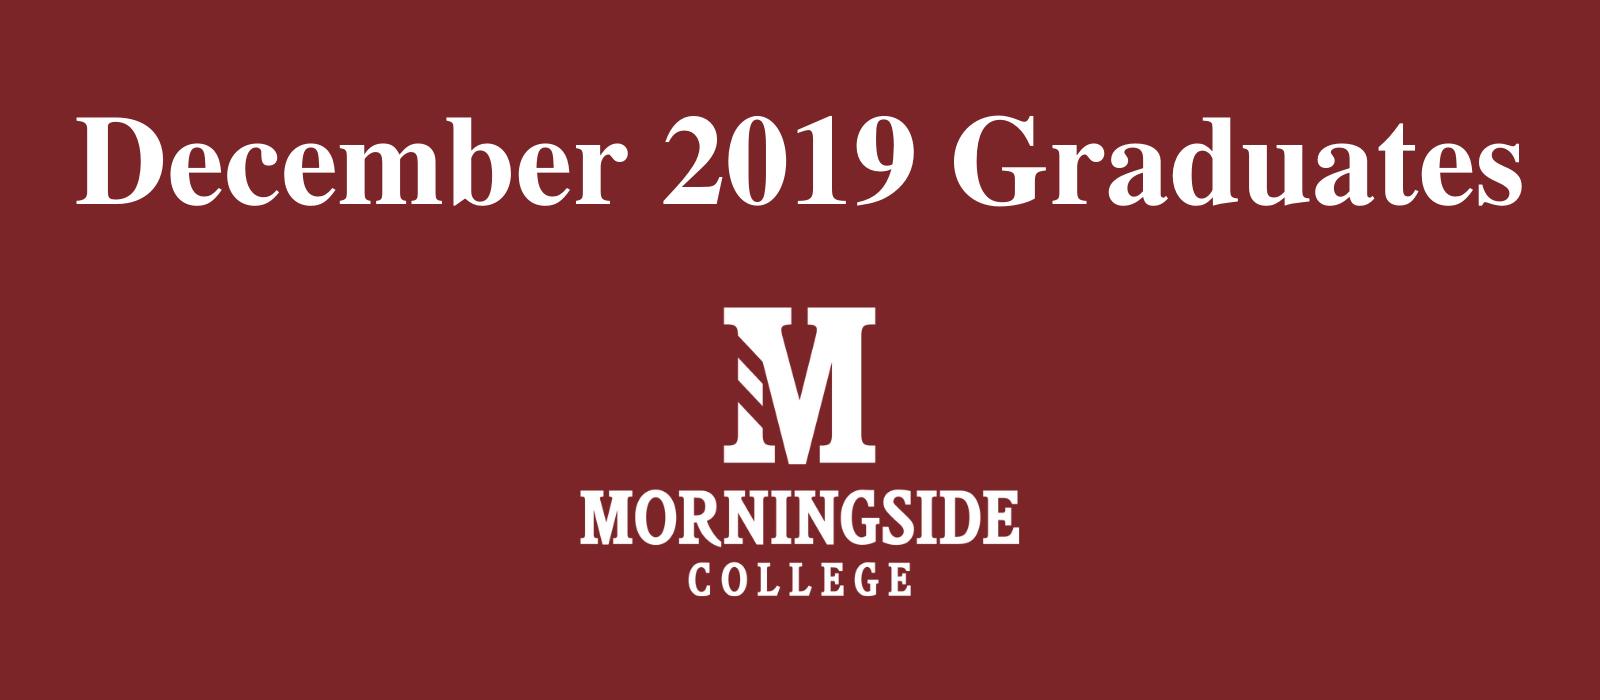 December 2019 Graduates image